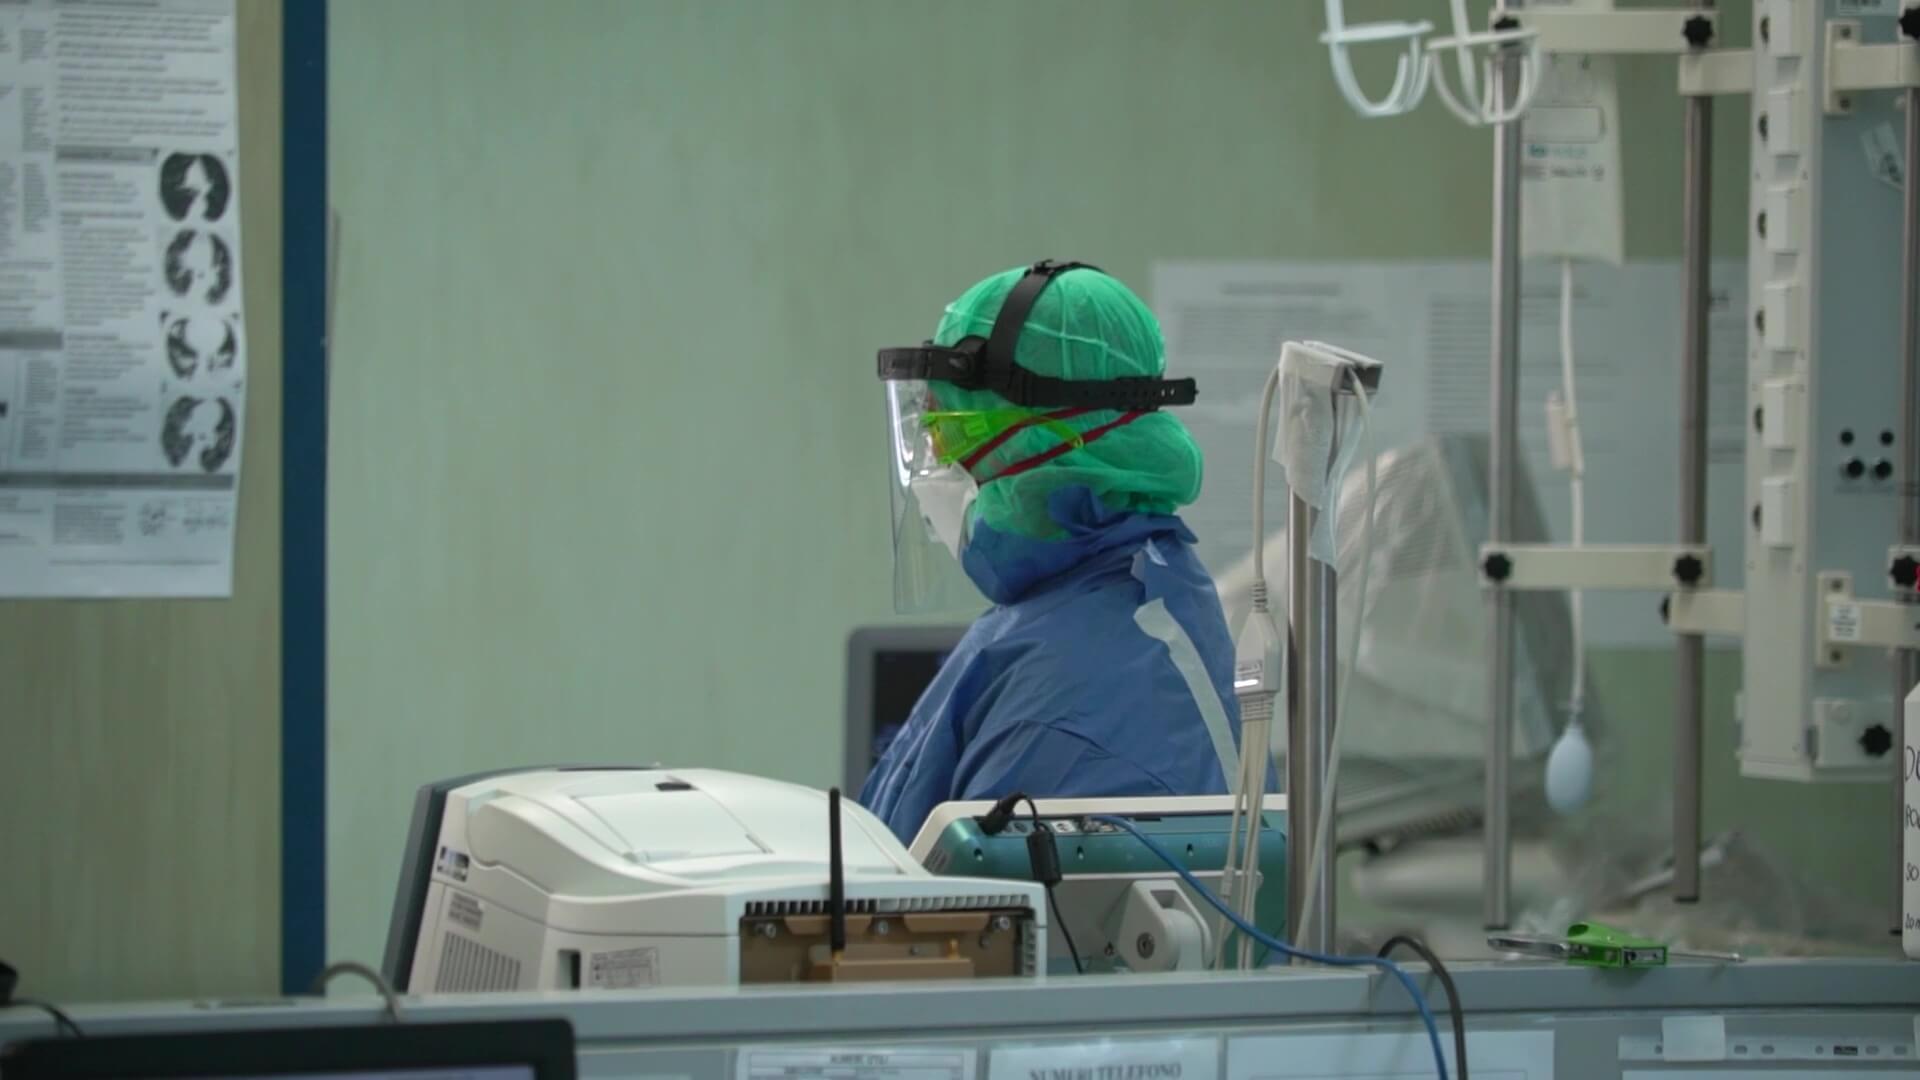 Coronavirus, un'altra vittima in Umbria, era residente a Bastia